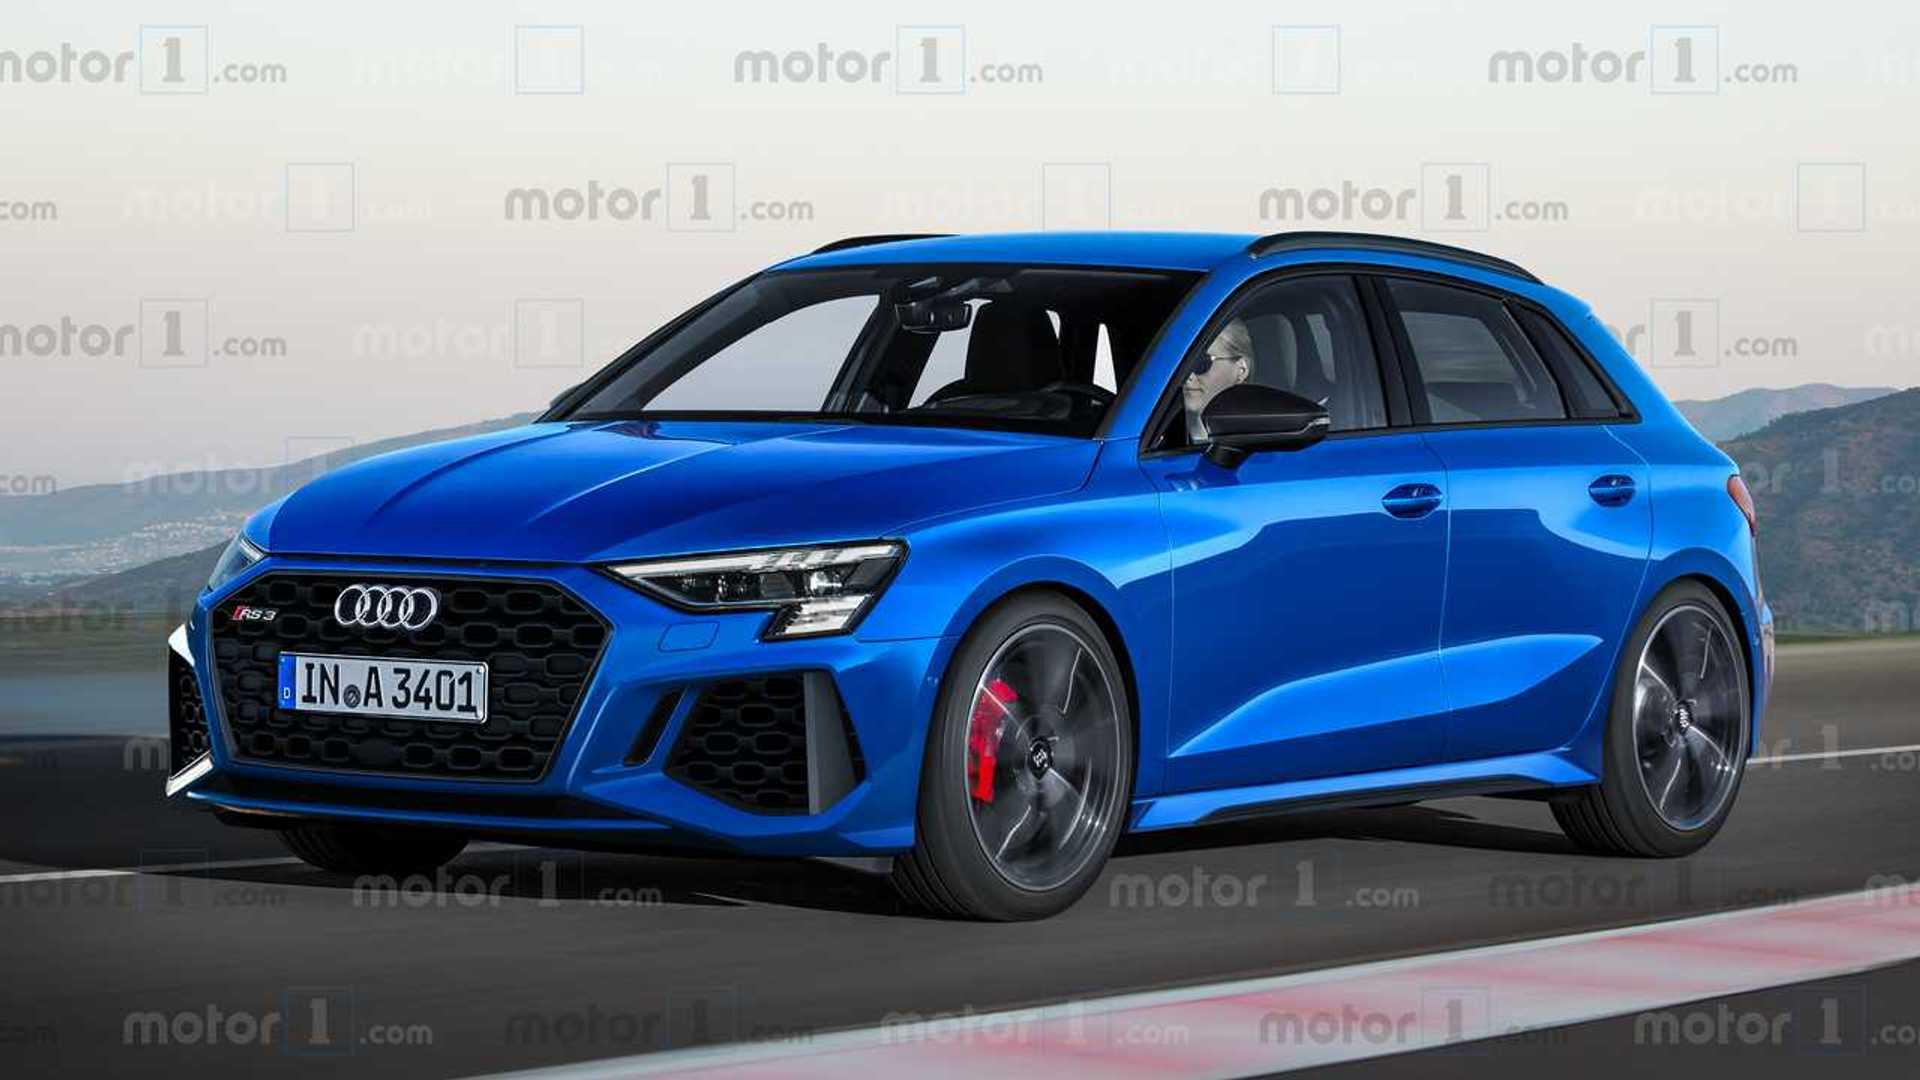 Kelebihan Audi Rs3 Top Model Tahun Ini